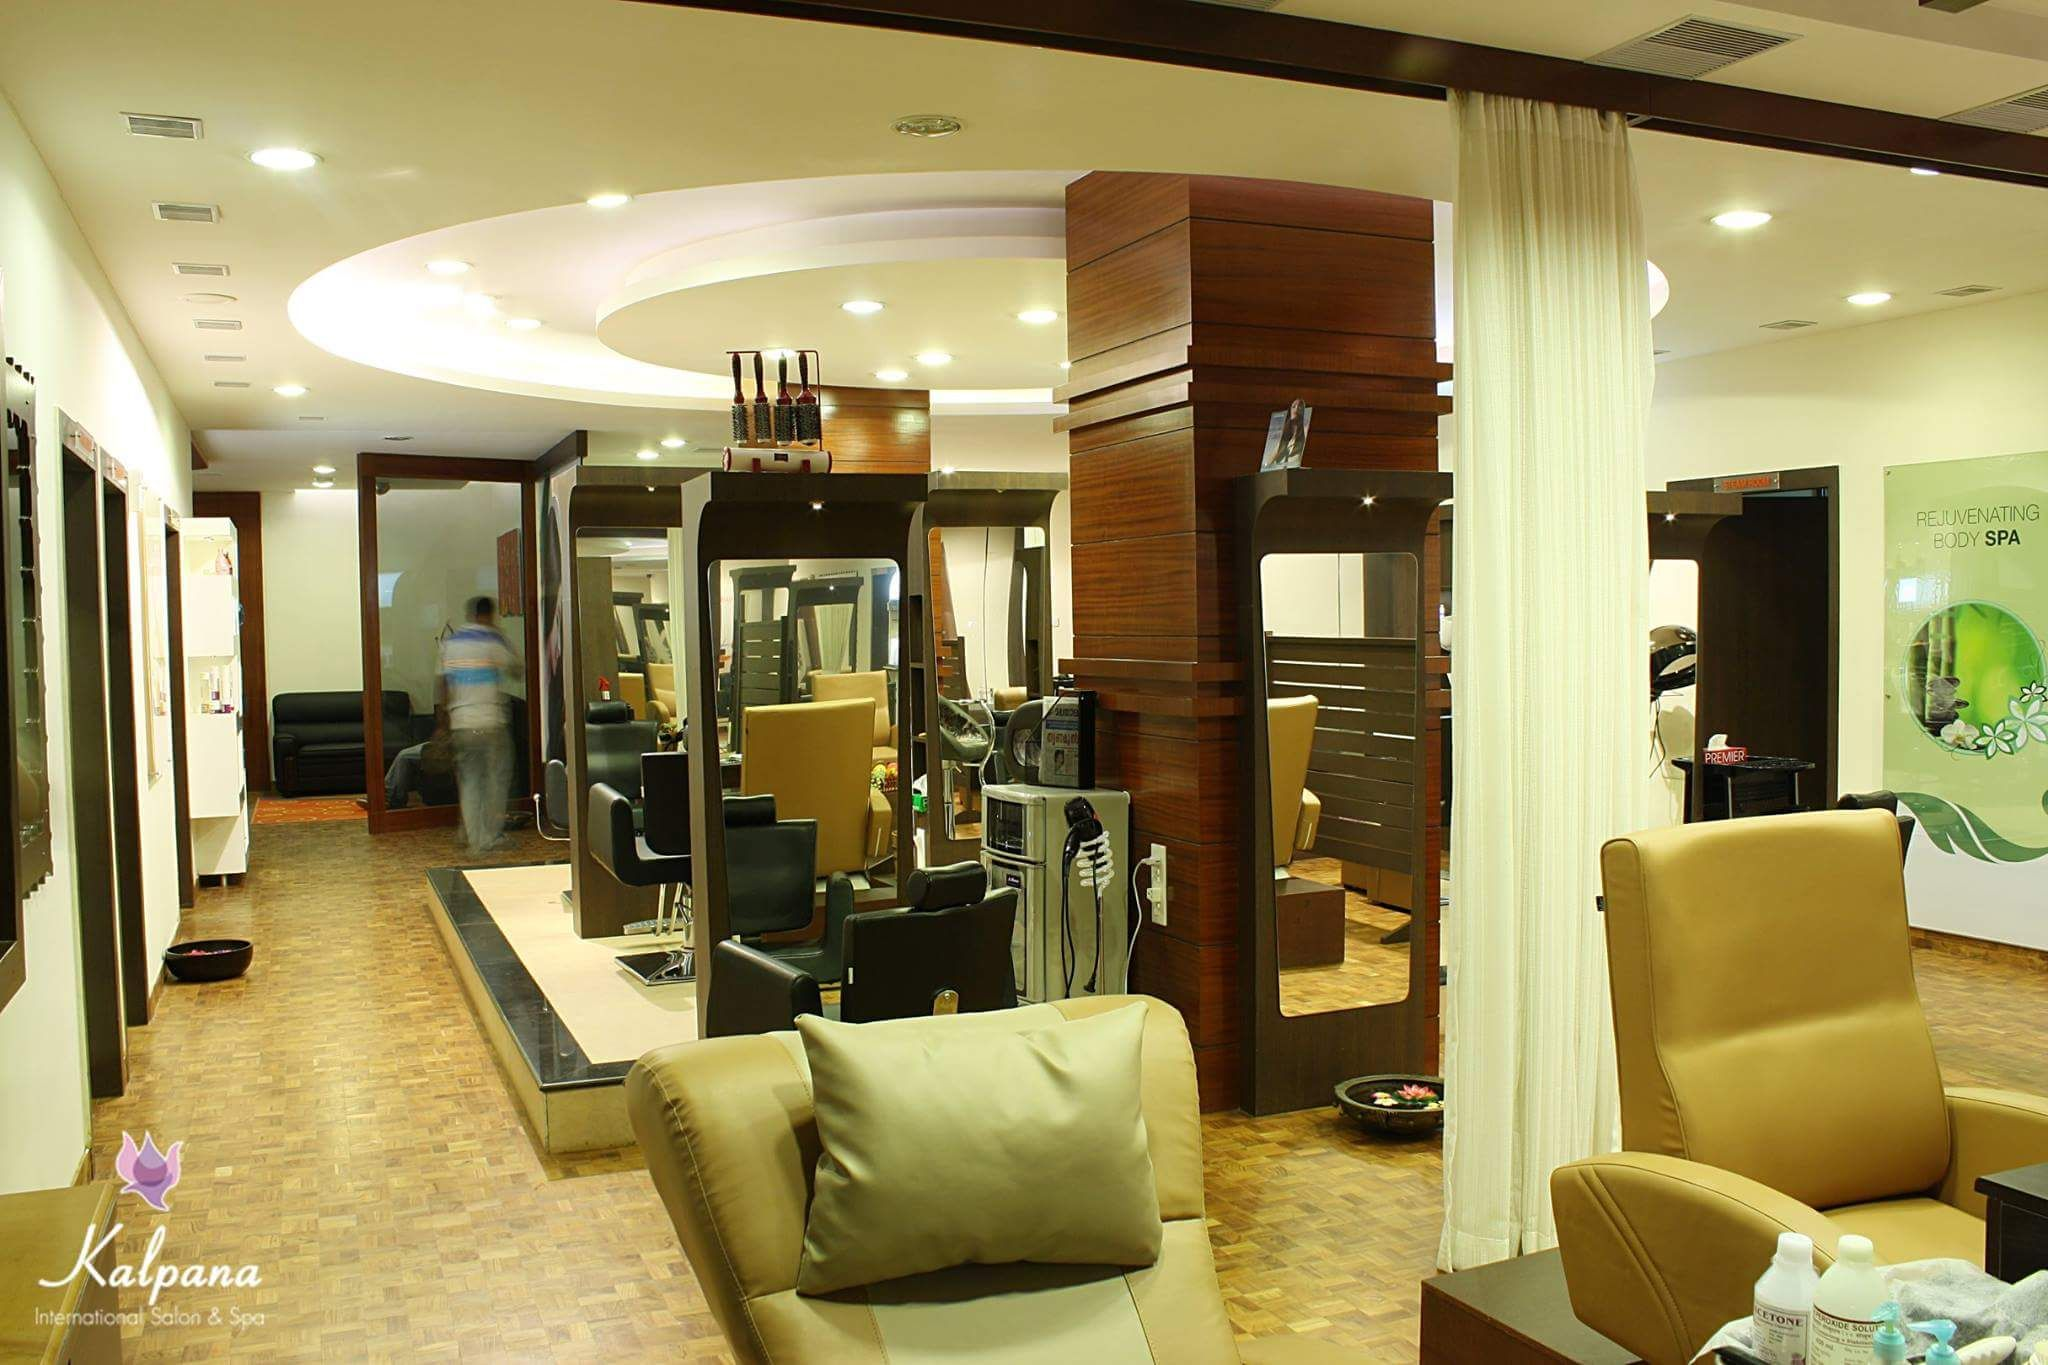 Brands Business News Kerala Classifieds Kalpana International